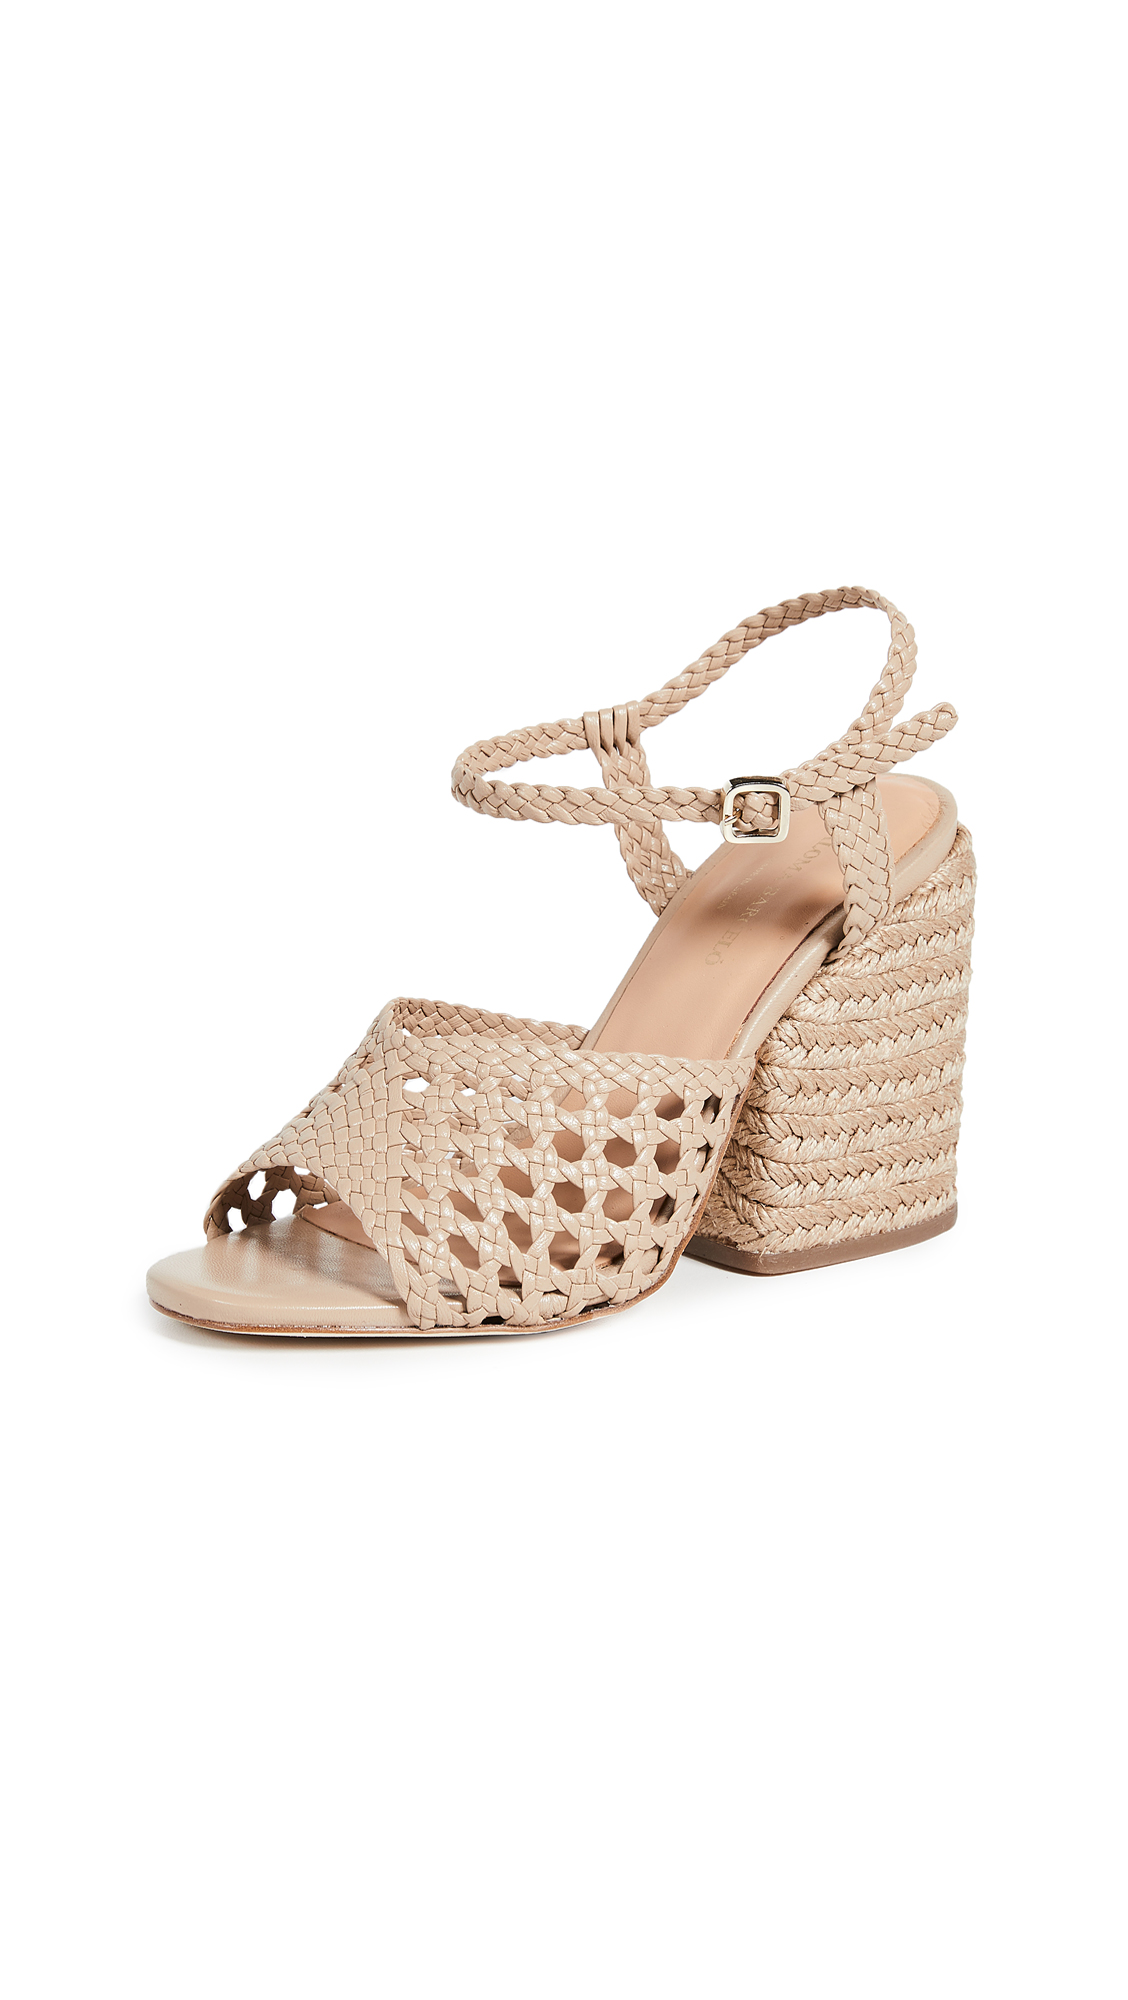 Paloma Barcelo Verane Woven Heeled Sandals - Taupe